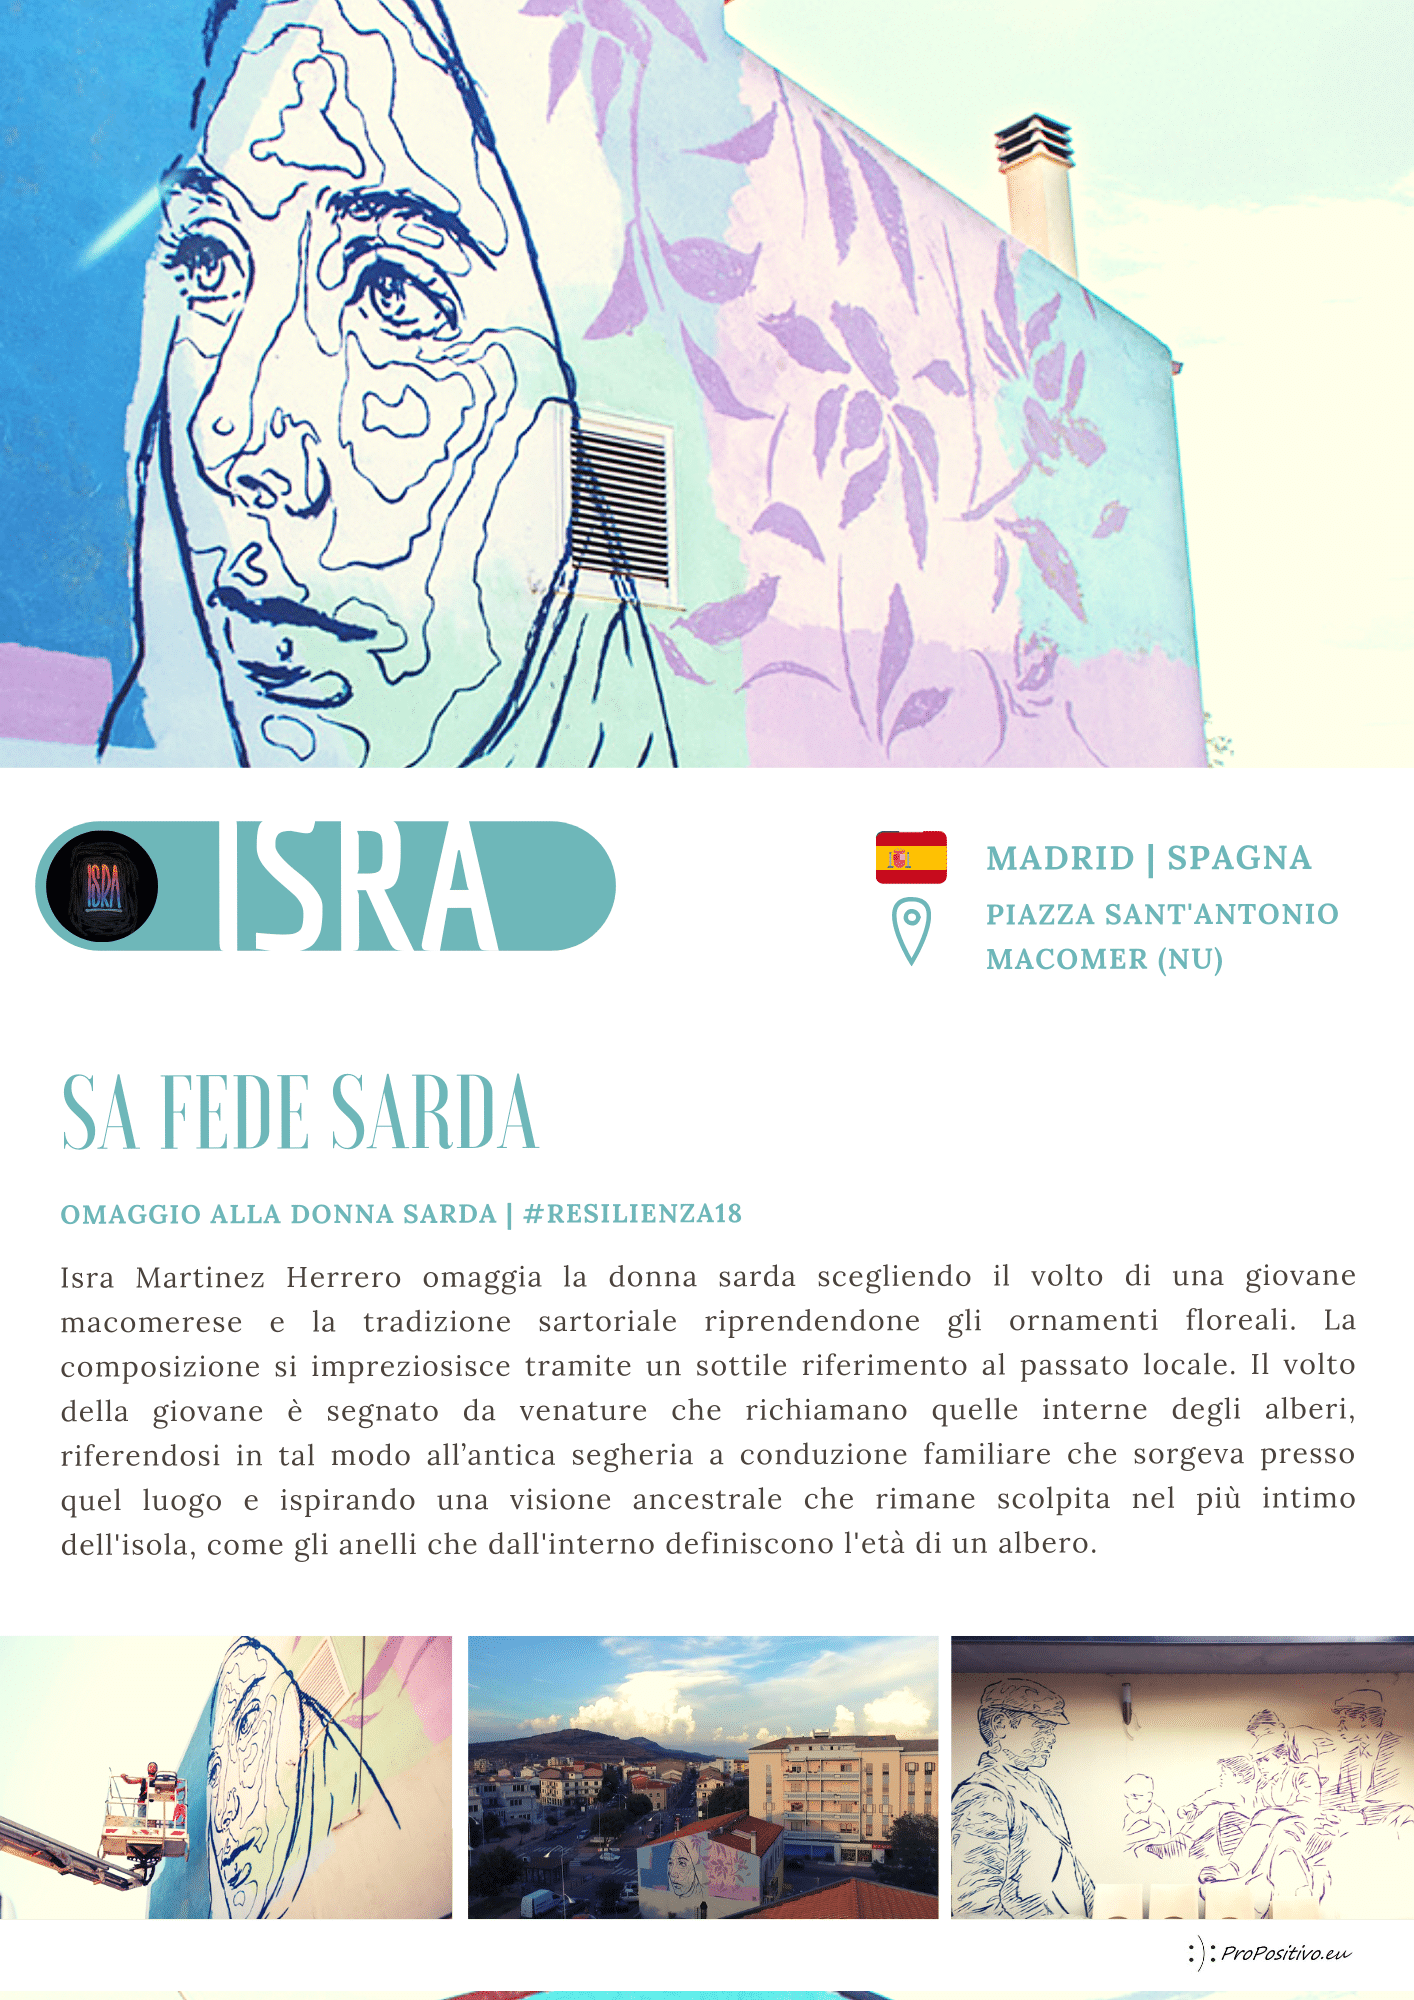 isra catalogo murales street art macomer sardegna festival resilienza propositivo 19